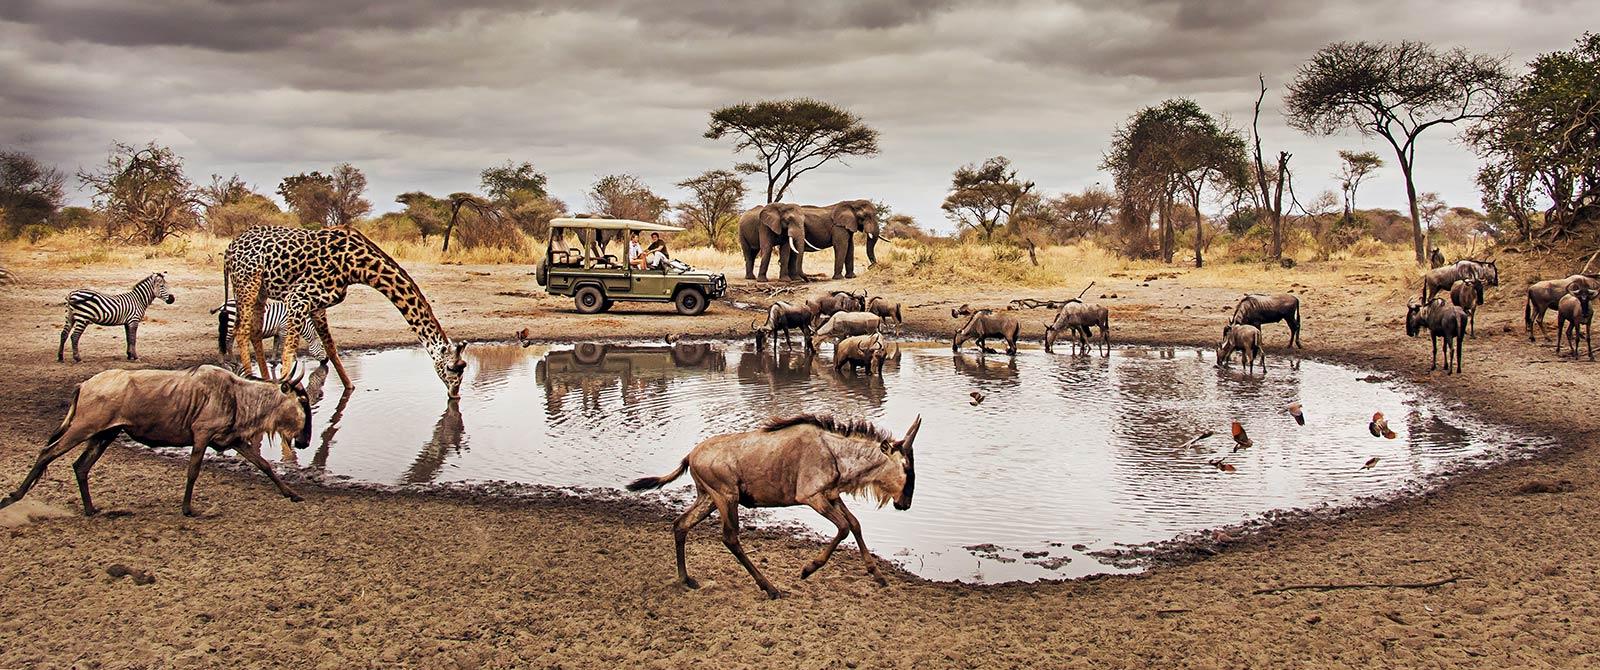 Active Waterhole on Game Drive - Little Chem Chem - Tanzania Highlights: Tarangire, Ngorongoro, and Serengeti Safari